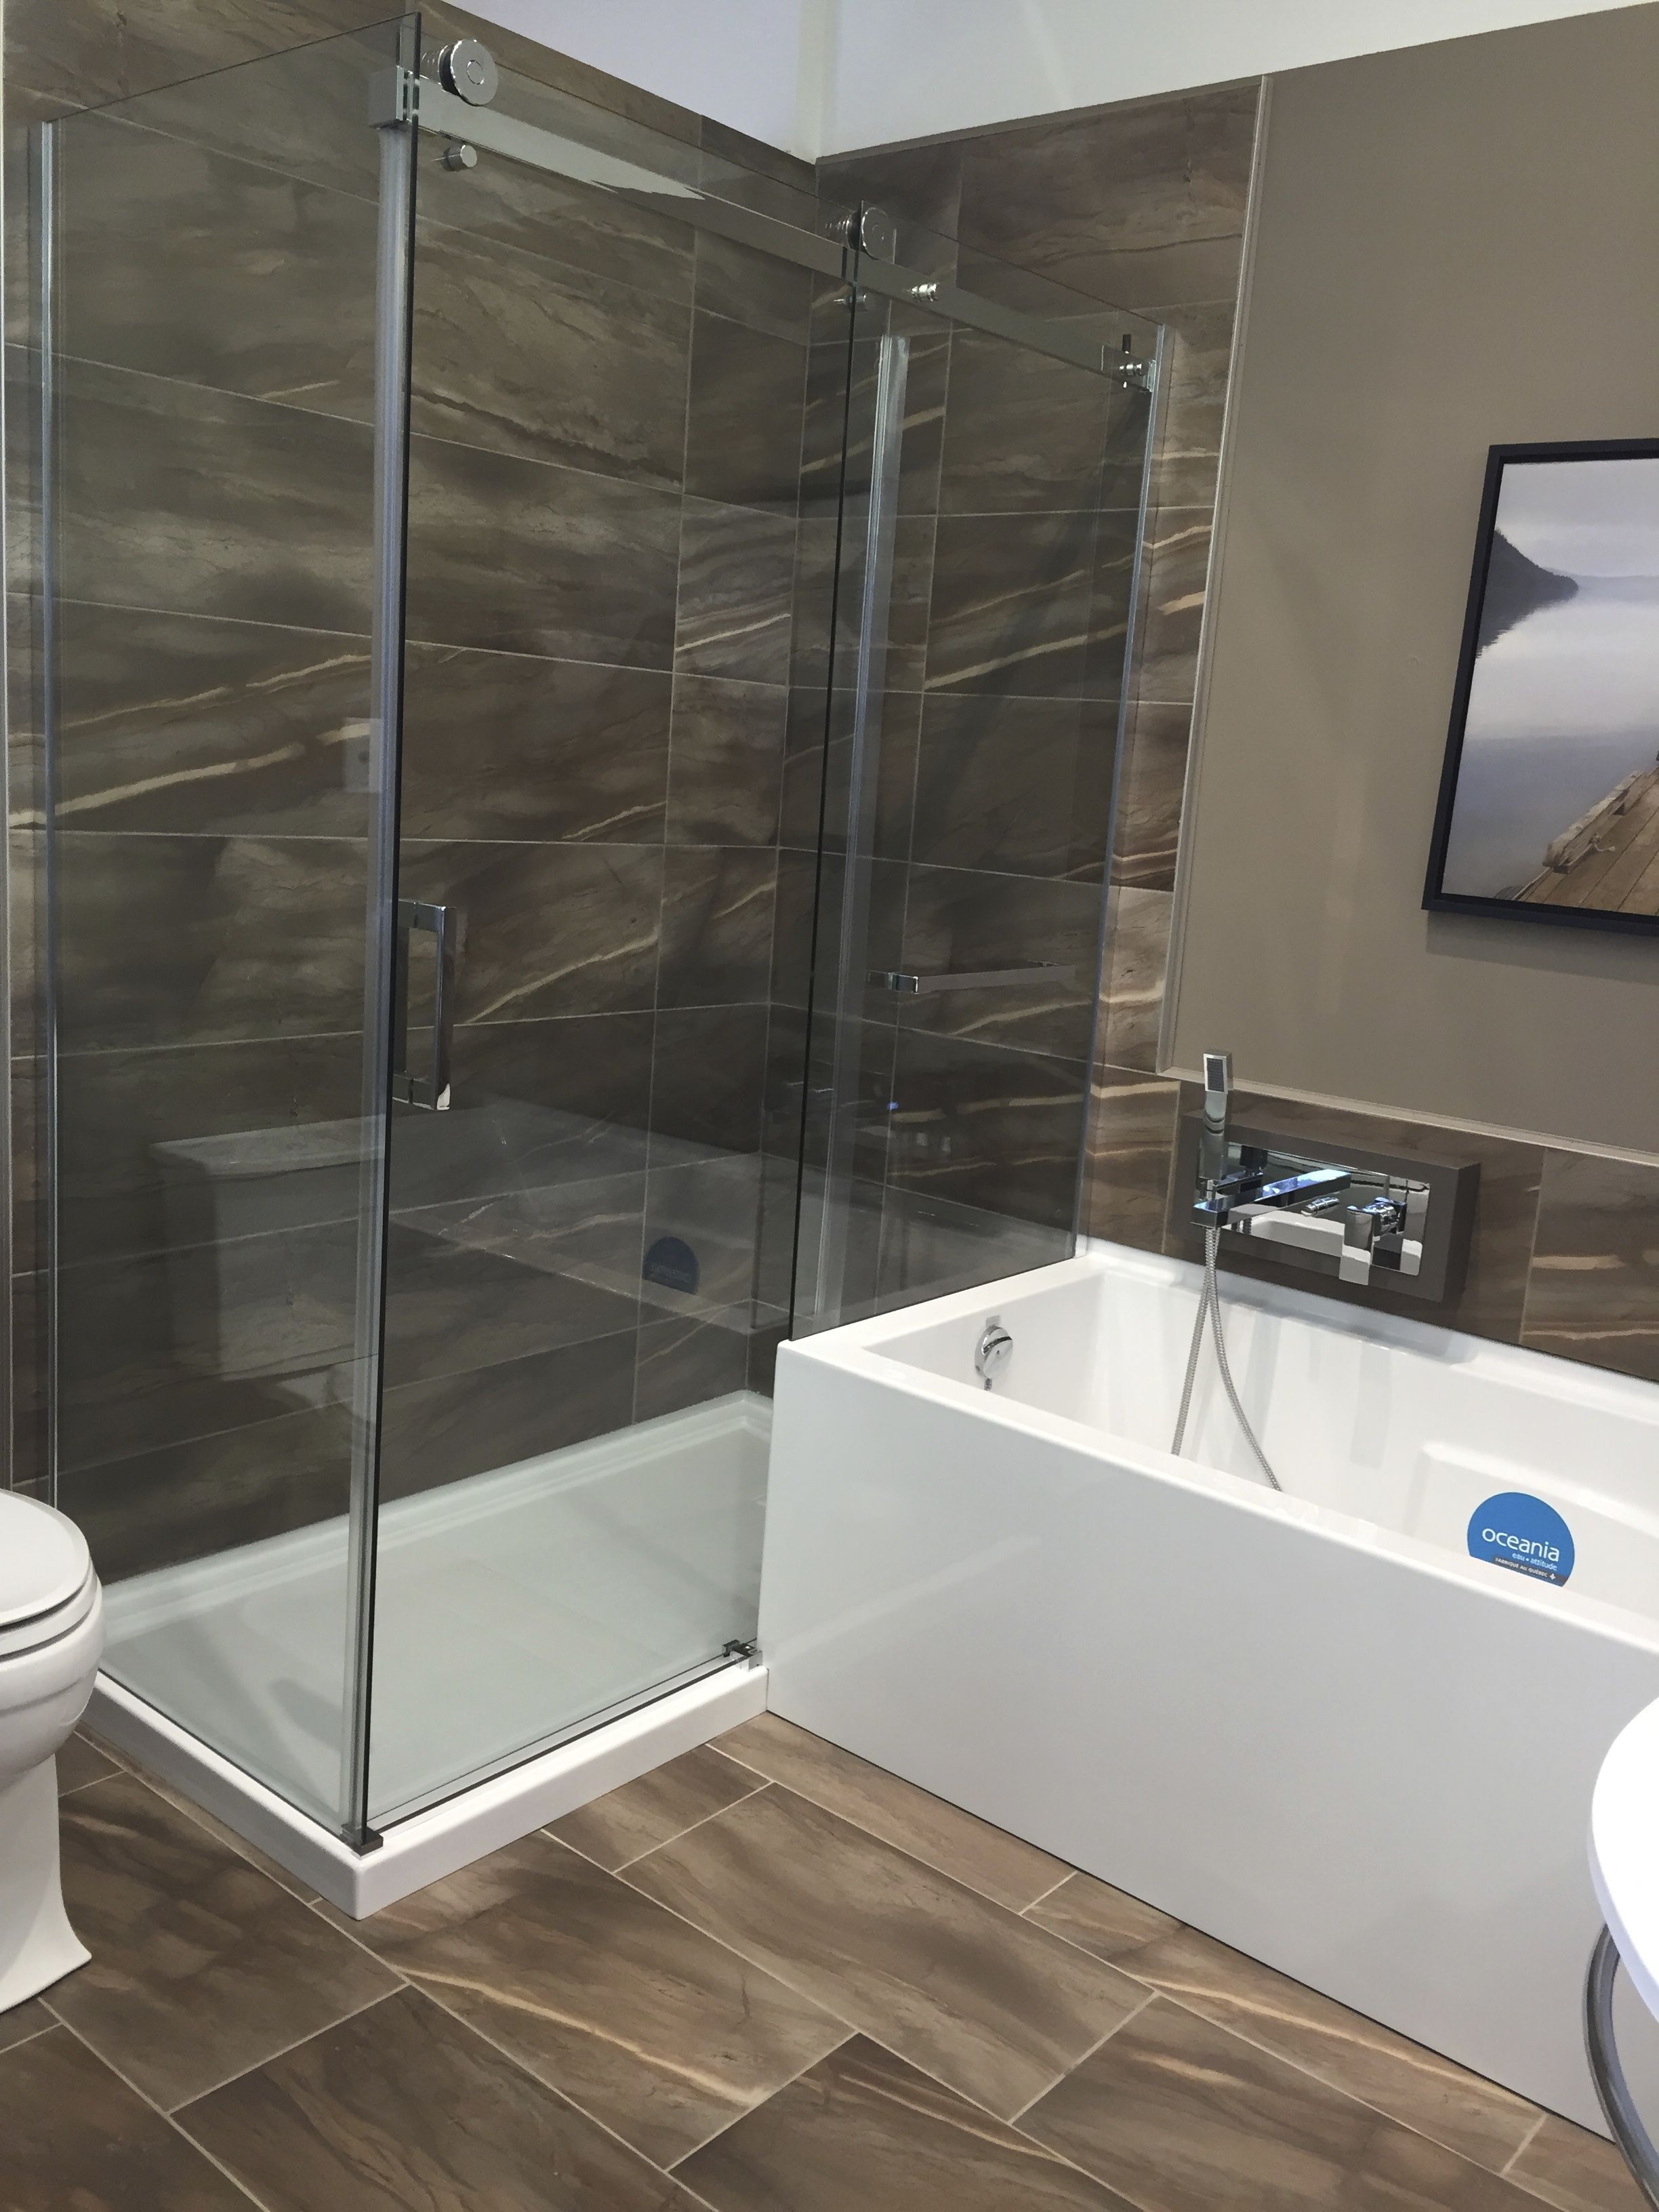 Design Optimale Concept Bathroom Oceania Design De Salle De Bain